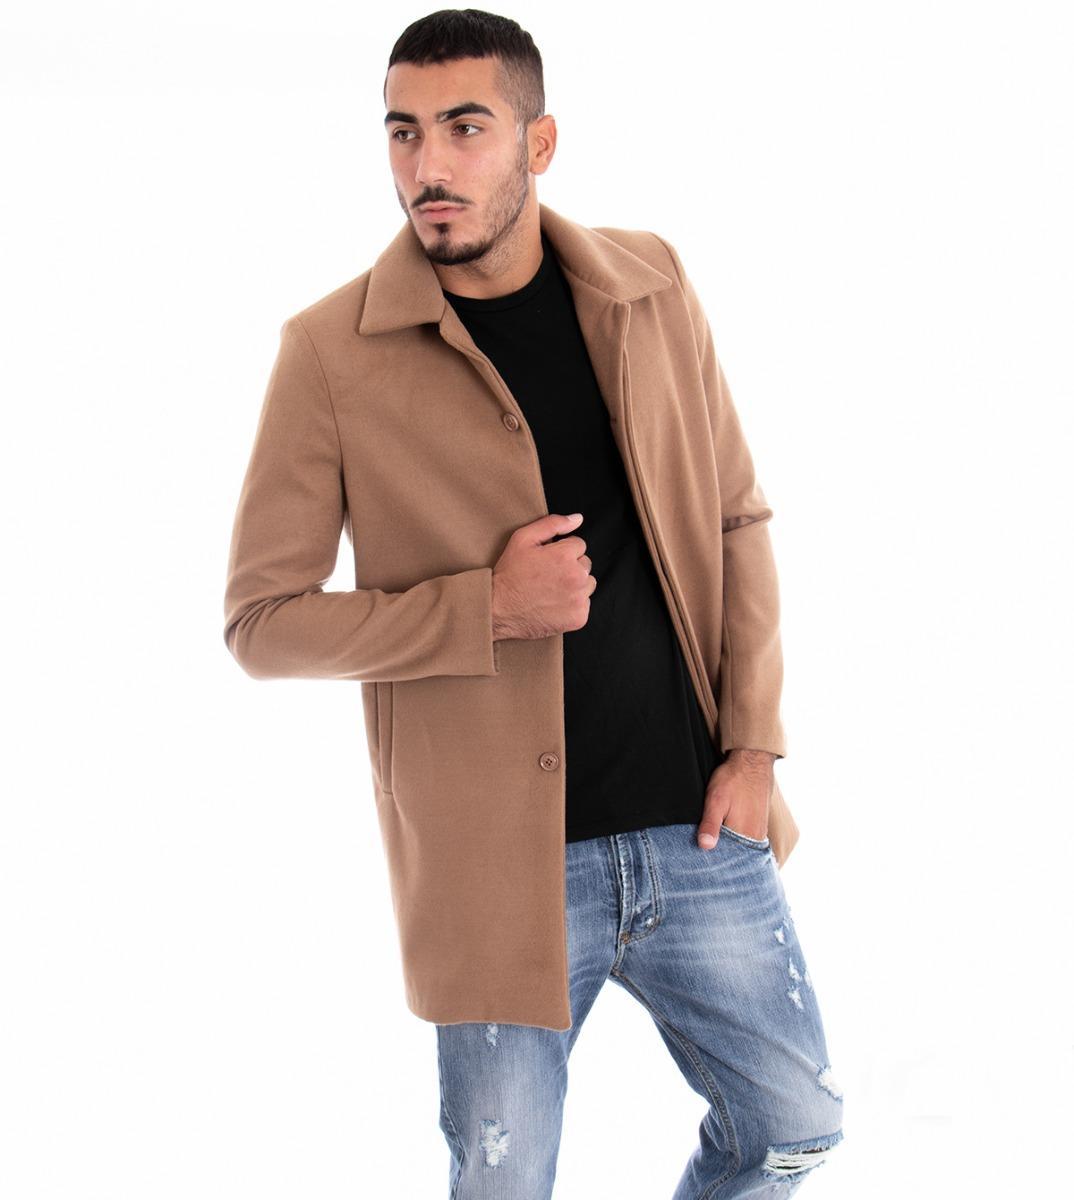 SéRieux Giacca Uomo Elegante Lunga Giubbotto Colletto Tinta Unita Camel Slim Giosal Clair Et Distinctif